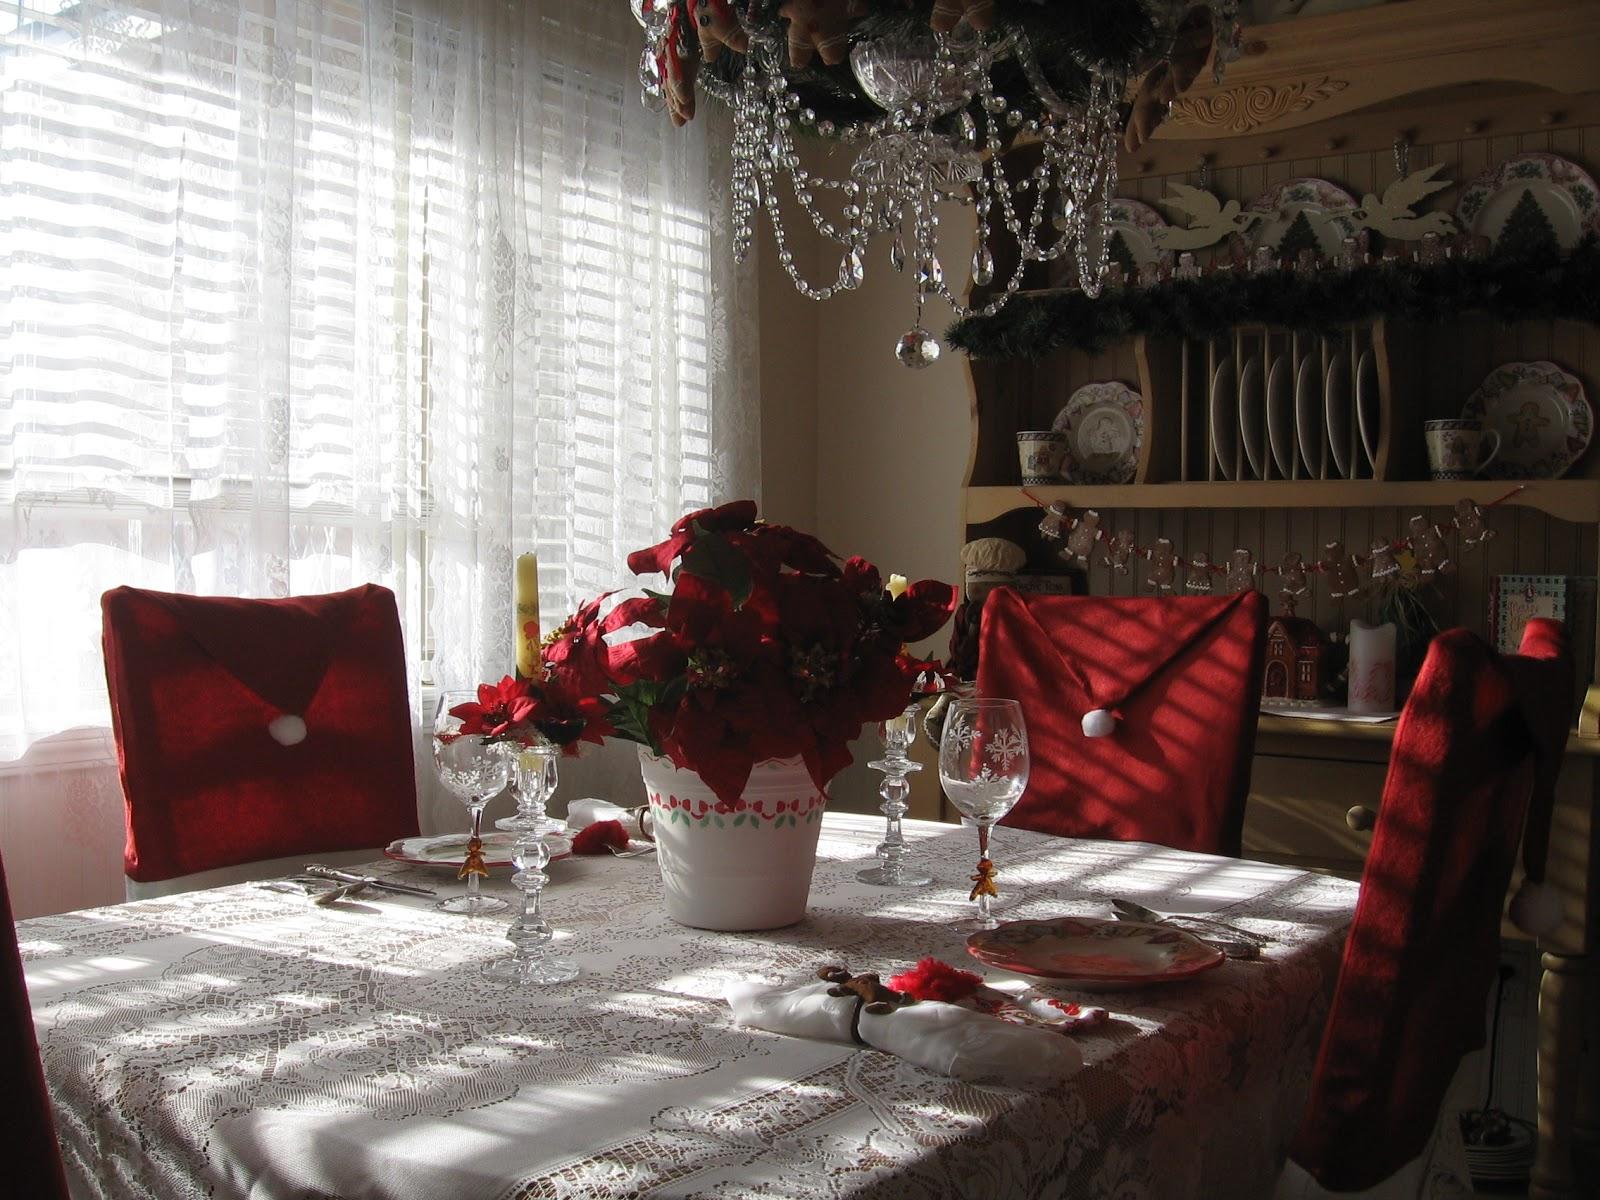 christmas chair covers white toilet walmart english purple ribbon darling santa hat